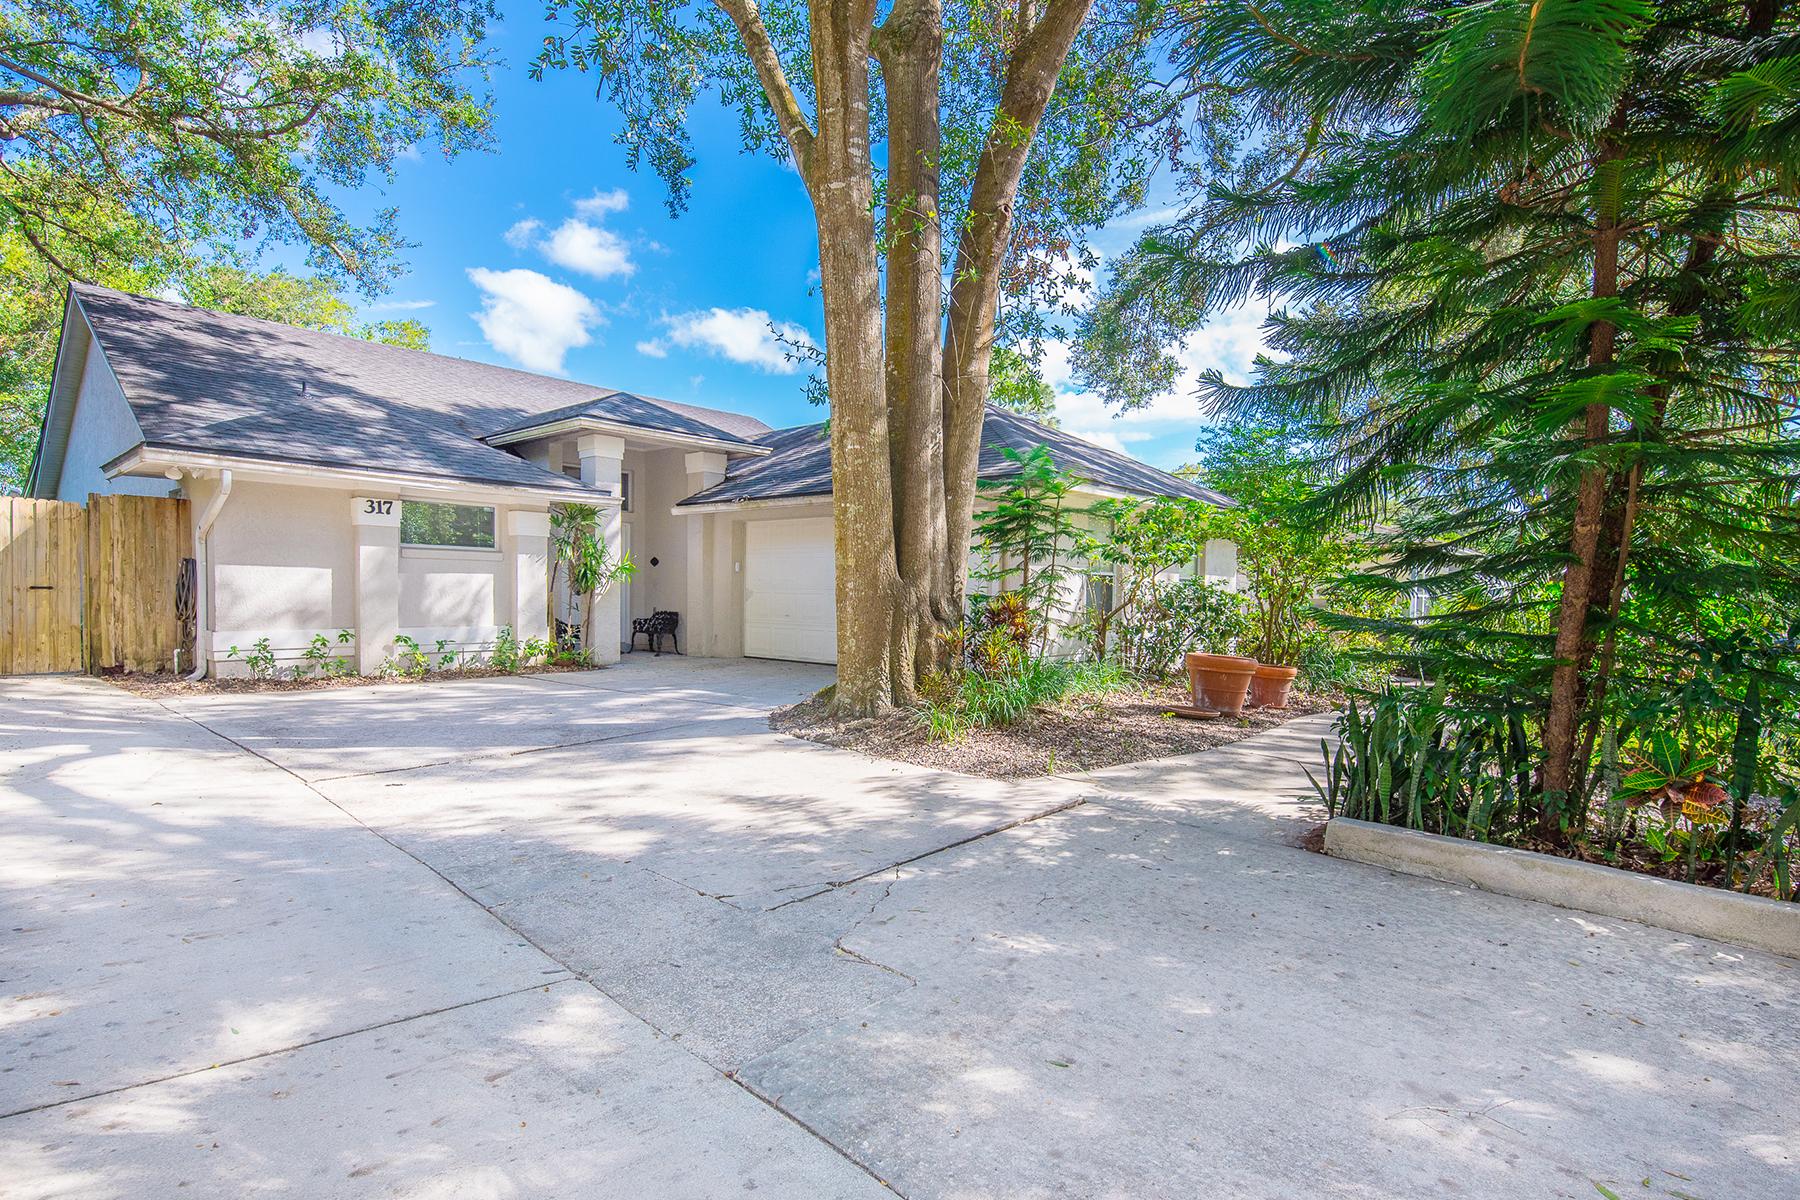 Villa per Vendita alle ore NORTH ORLANDO - ALTAMONTE SPRINGS 317 Ridgewood St Altamonte Springs, Florida 32701 Stati Uniti